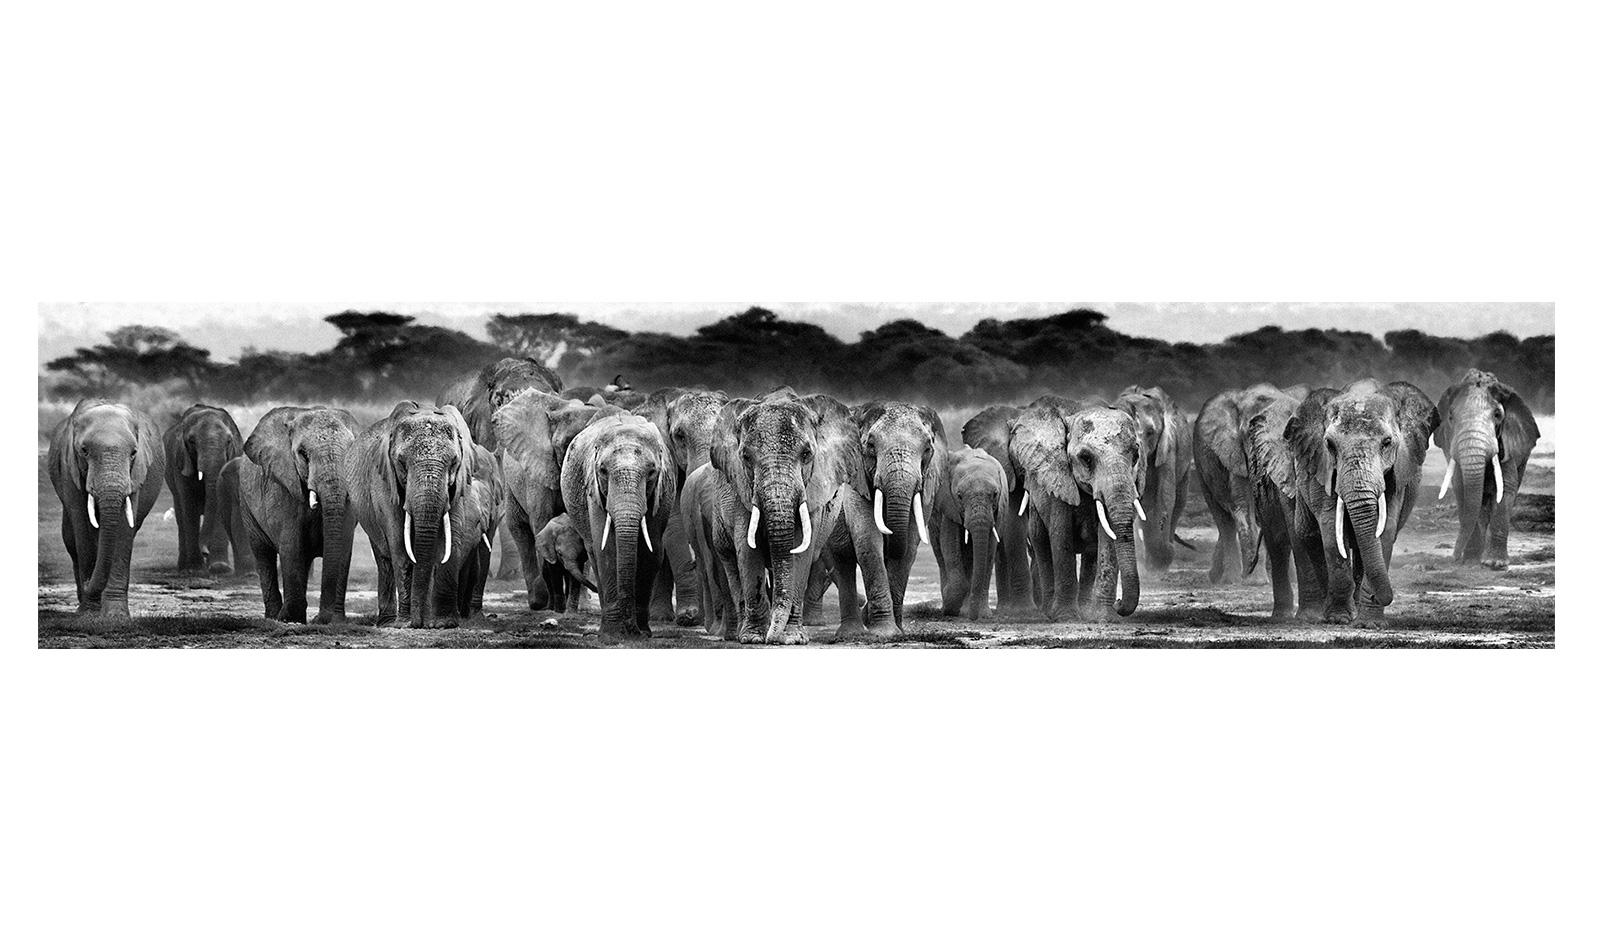 safari magazine gujarati pdf free download 2017